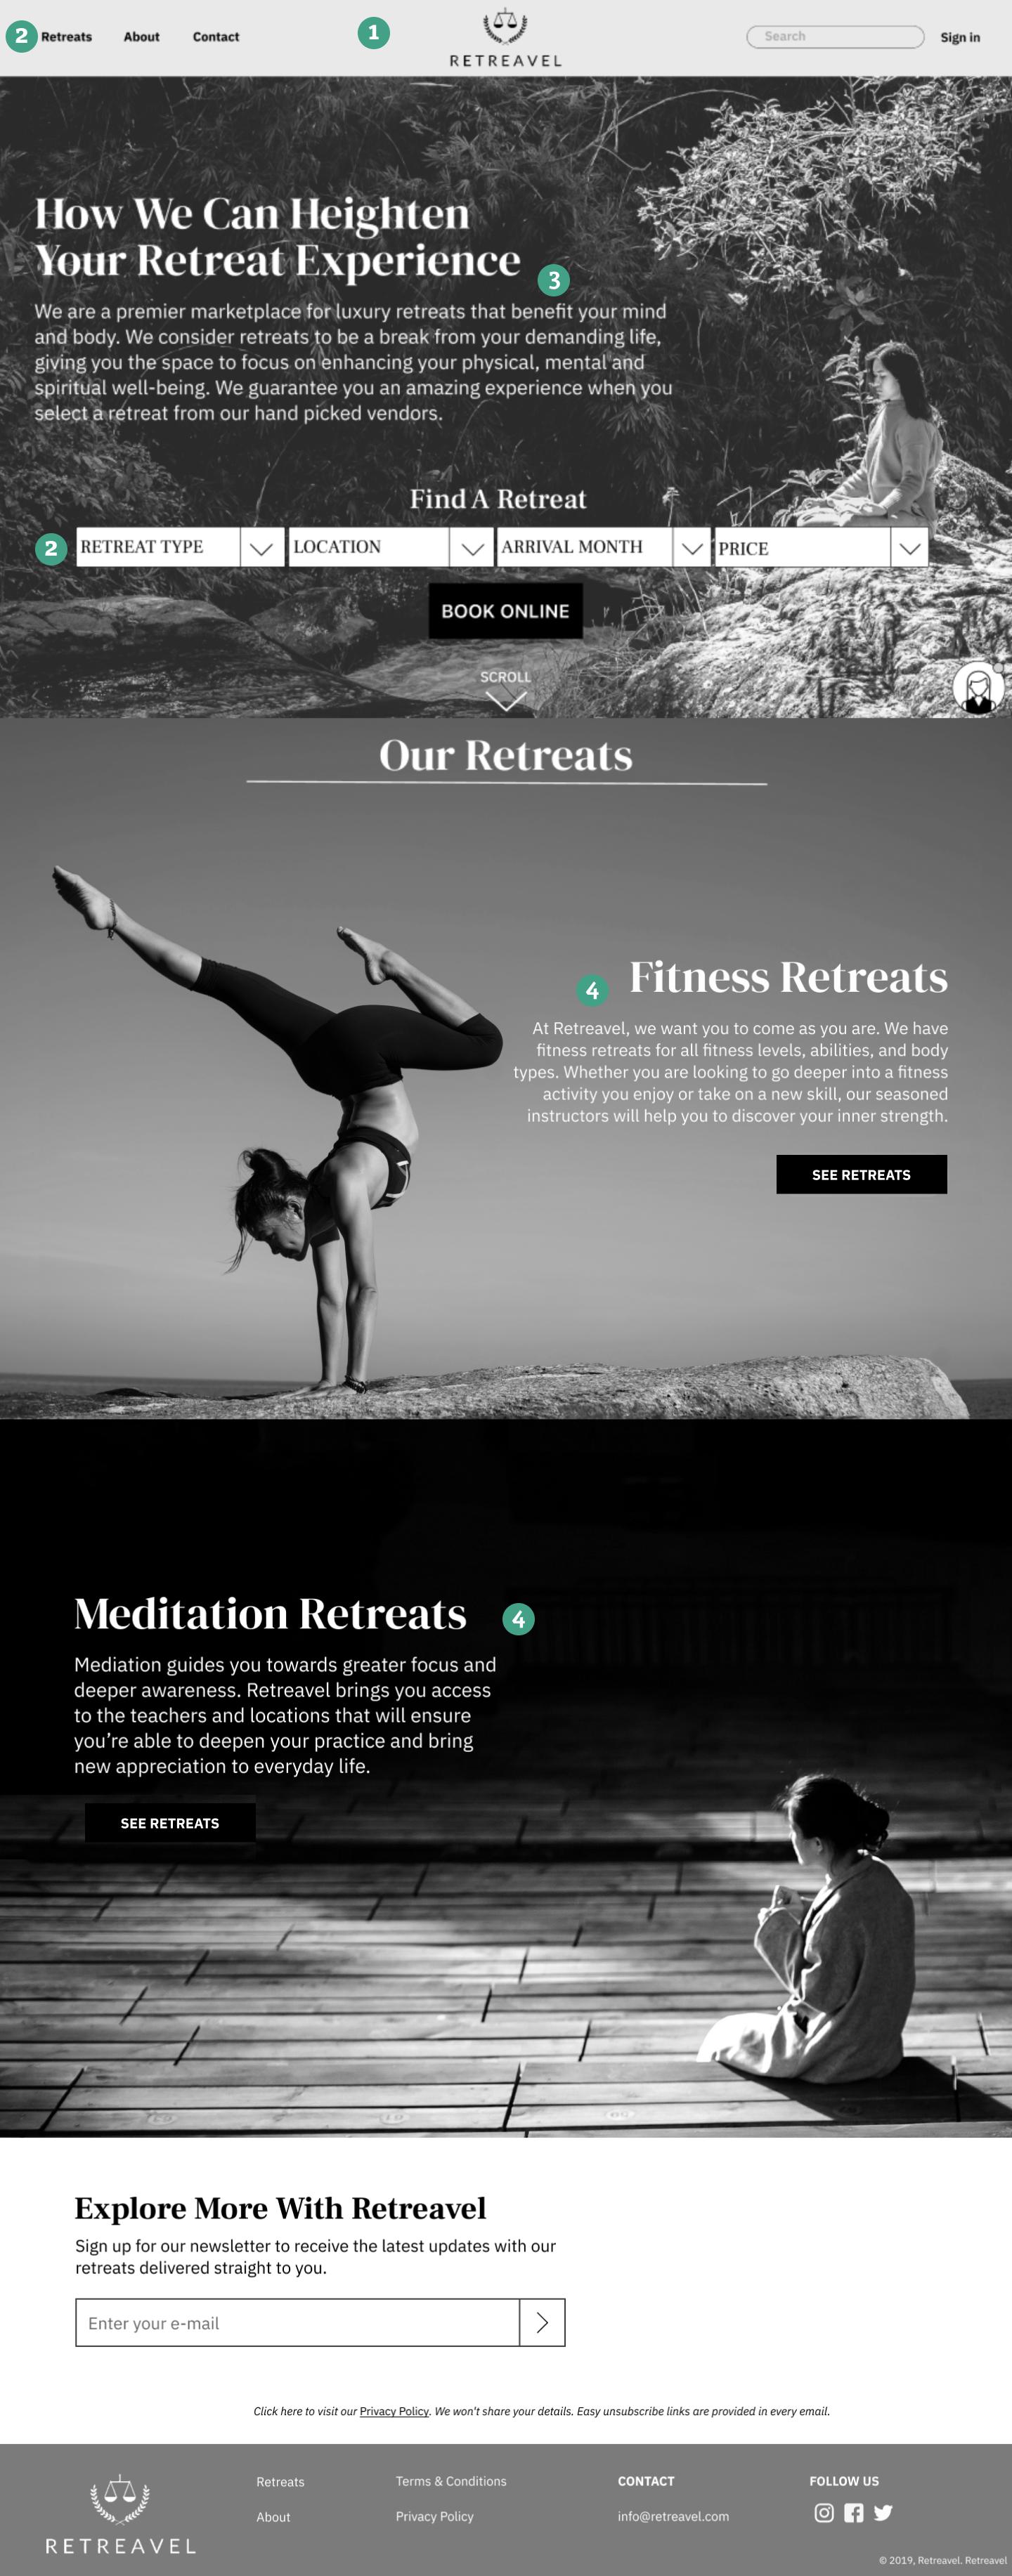 Retreavel Homepage(scroll on image)